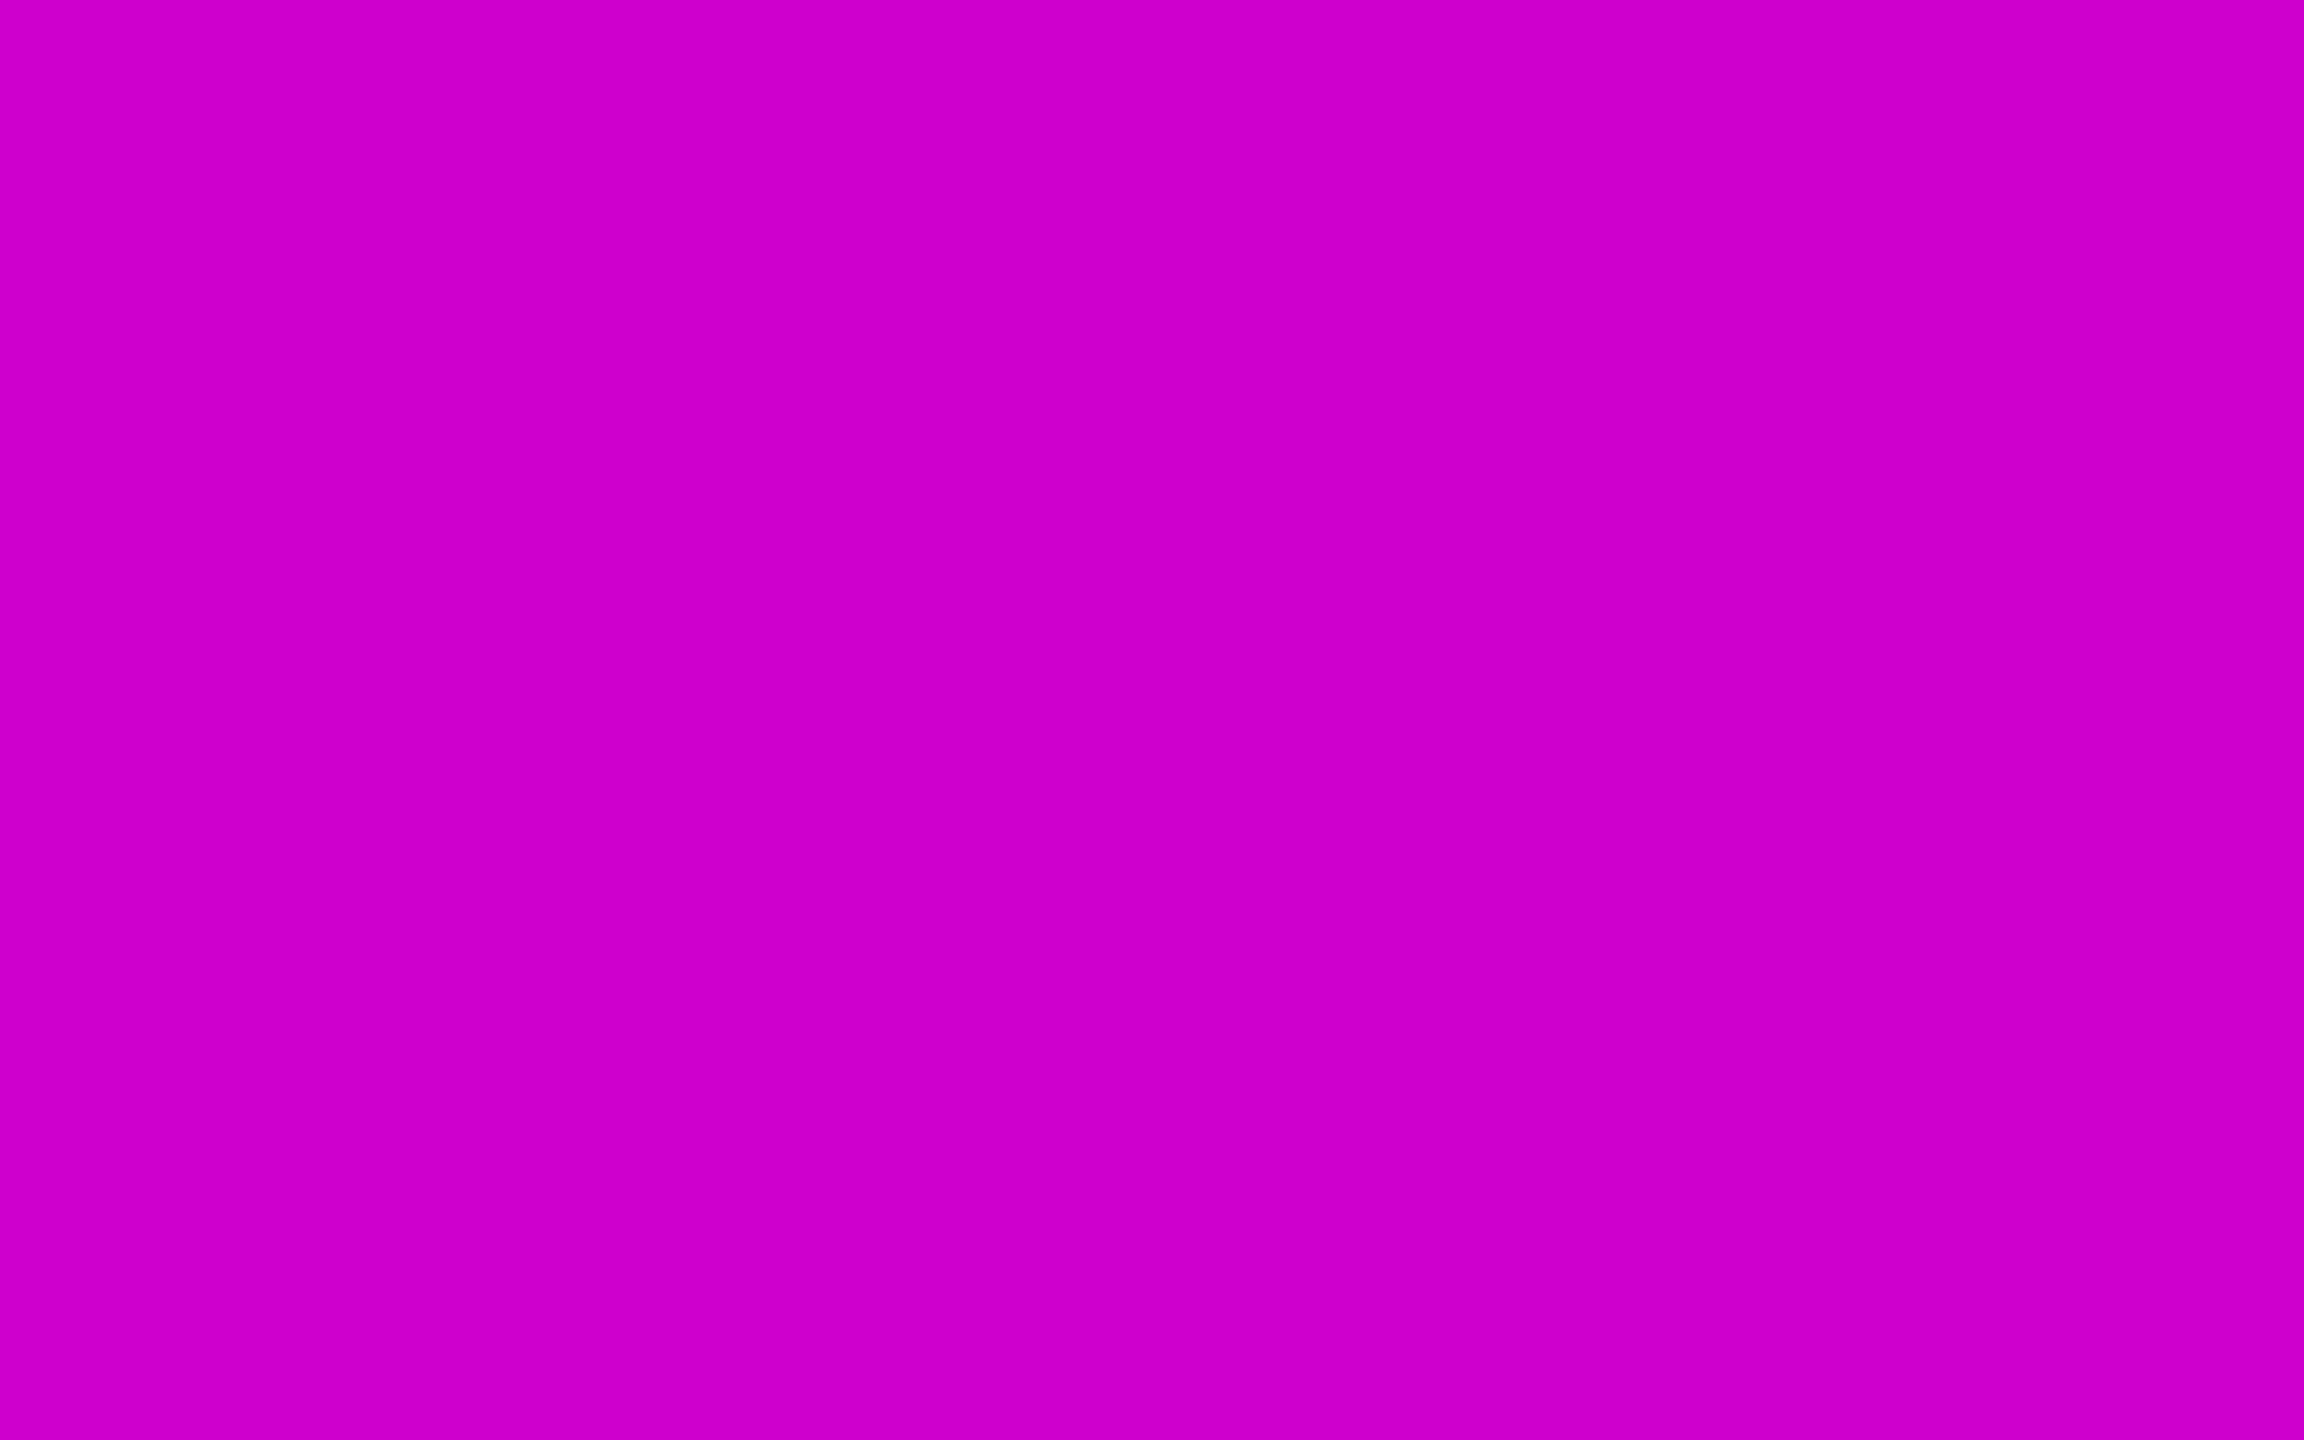 2304x1440 Deep Magenta Solid Color Background